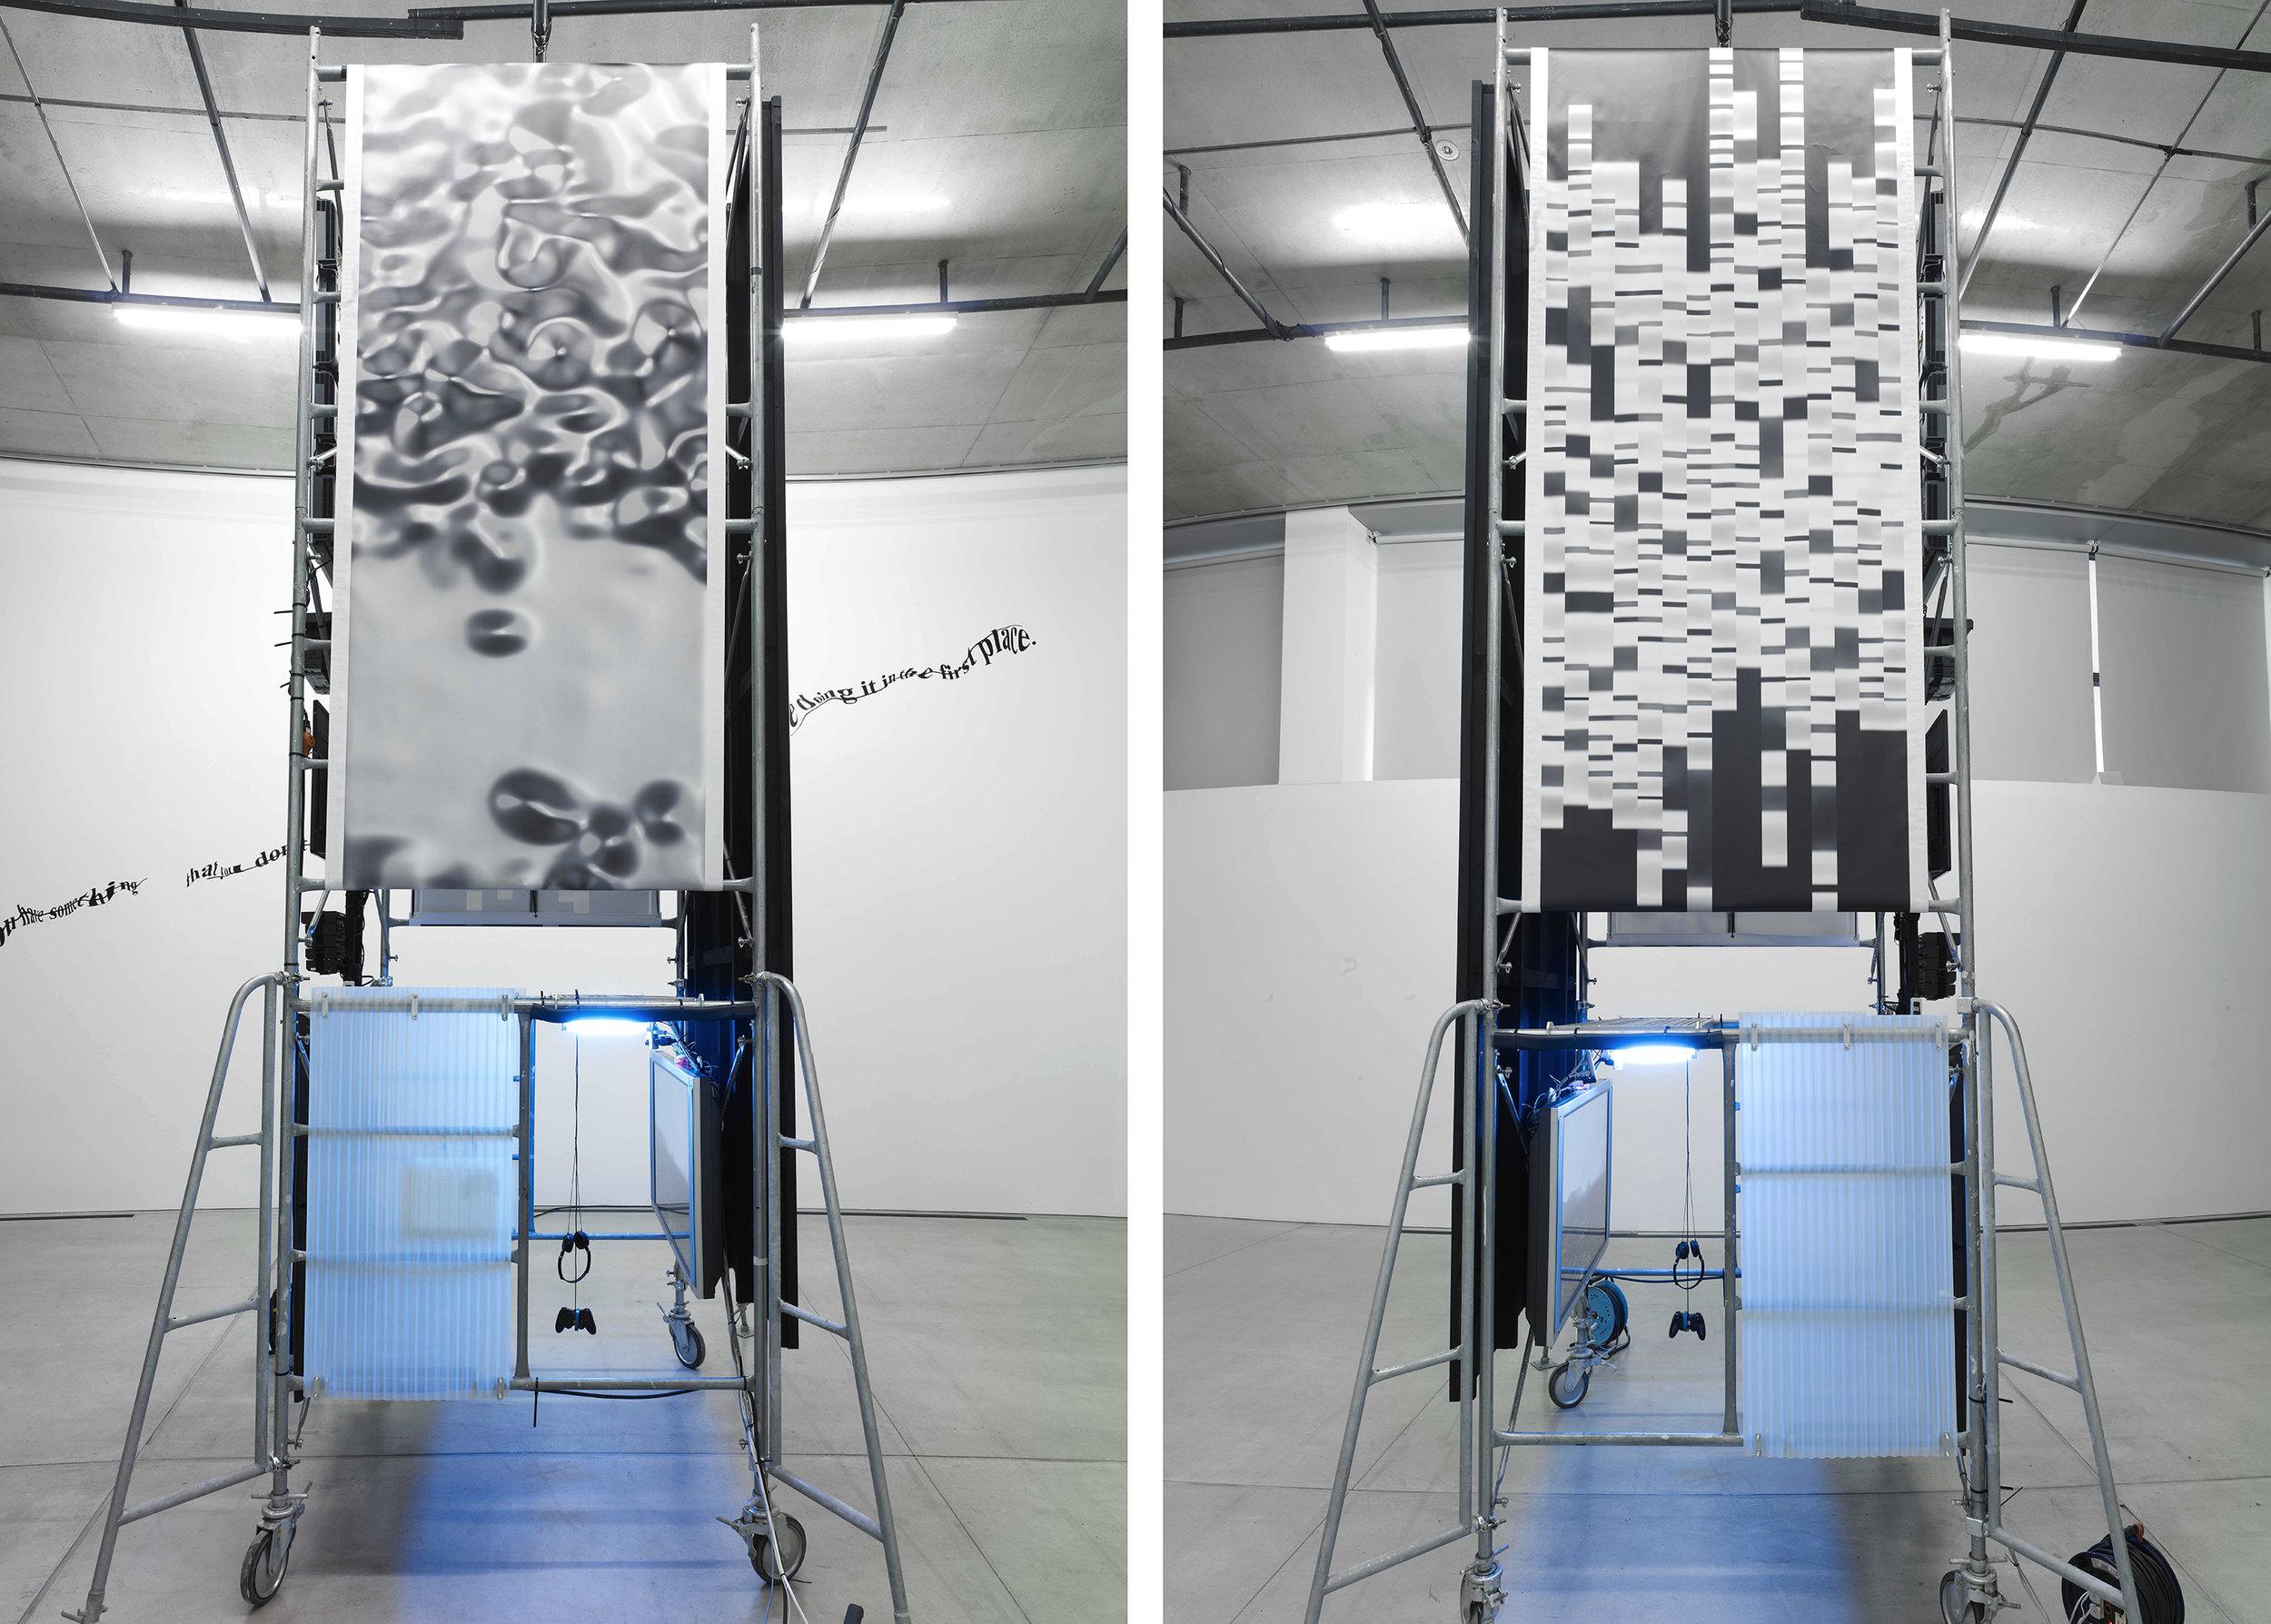 Installation View Displaying  Statistical Motion Analysis , Digital Print on Vinyl. Photo Credit: Tadasu Yamamoto Courtesy of: ACAC